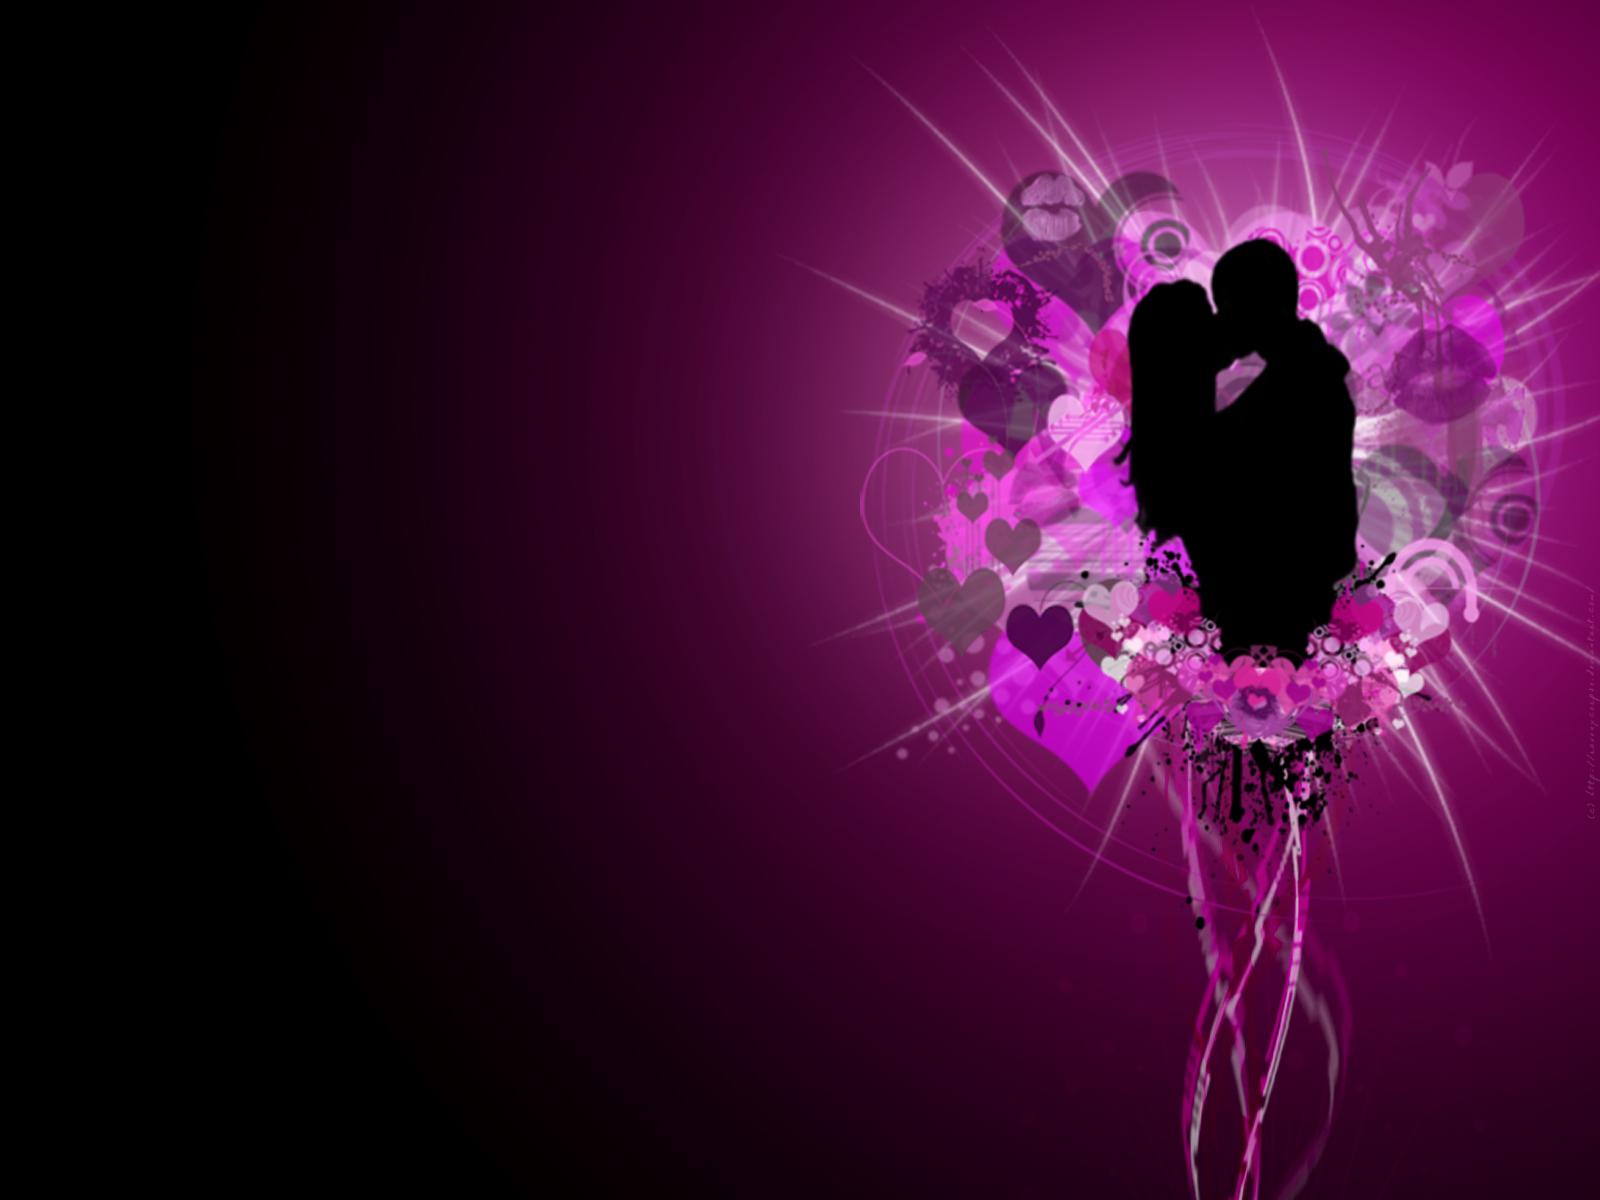 romantic wallpapers hd wallpapers hd